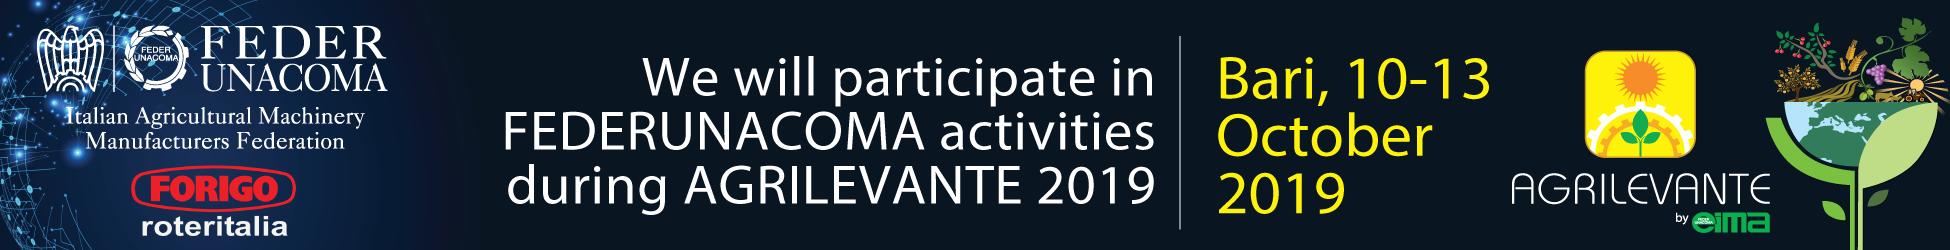 agrilevante-2019